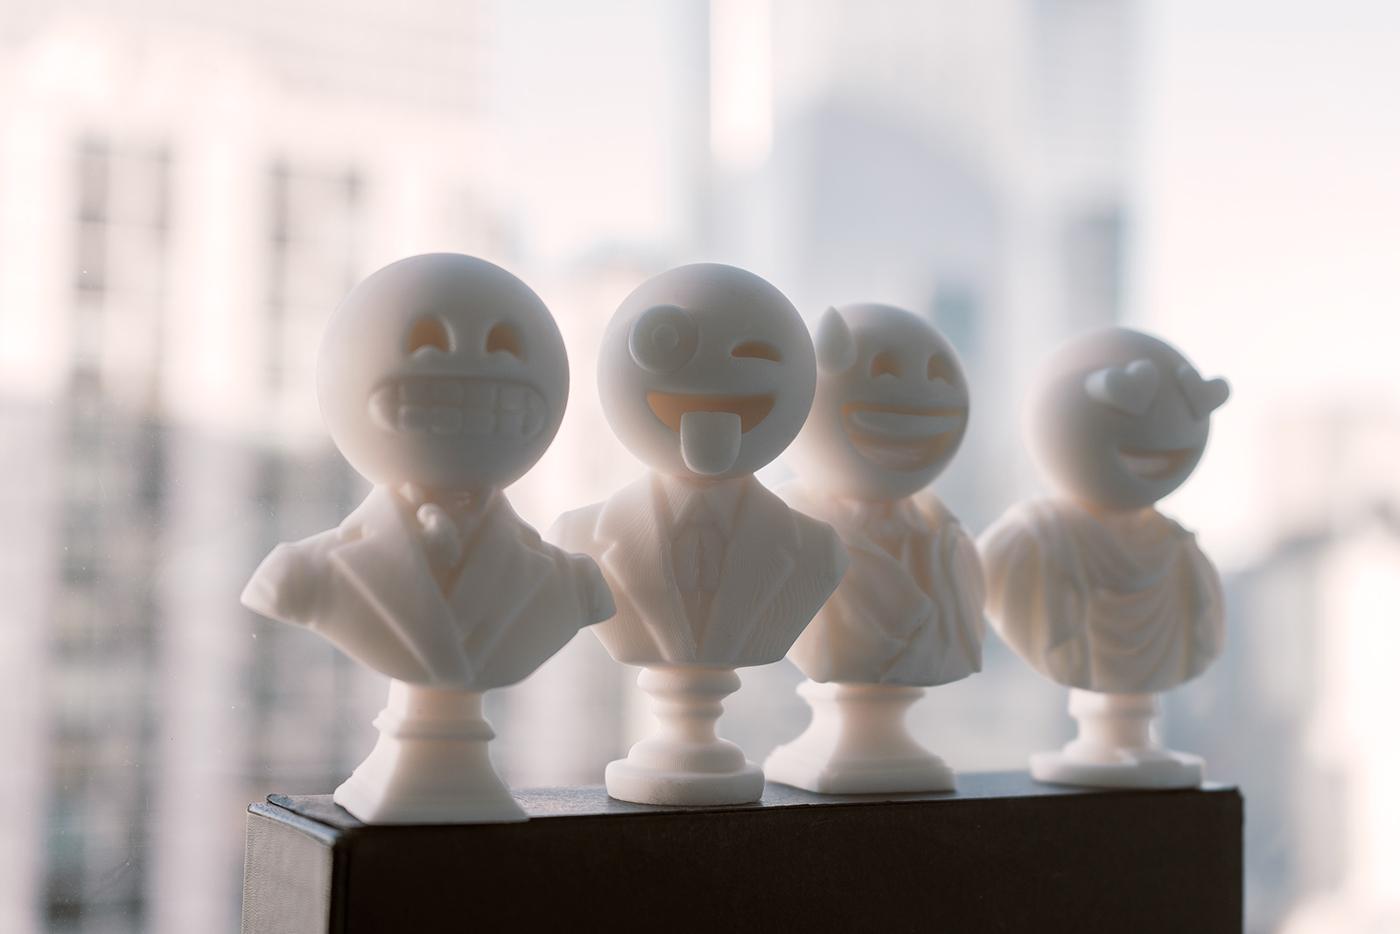 Emoji 3d print 3D Printing sculptmojis art vinyl toy Digital Art  CGI sculpture